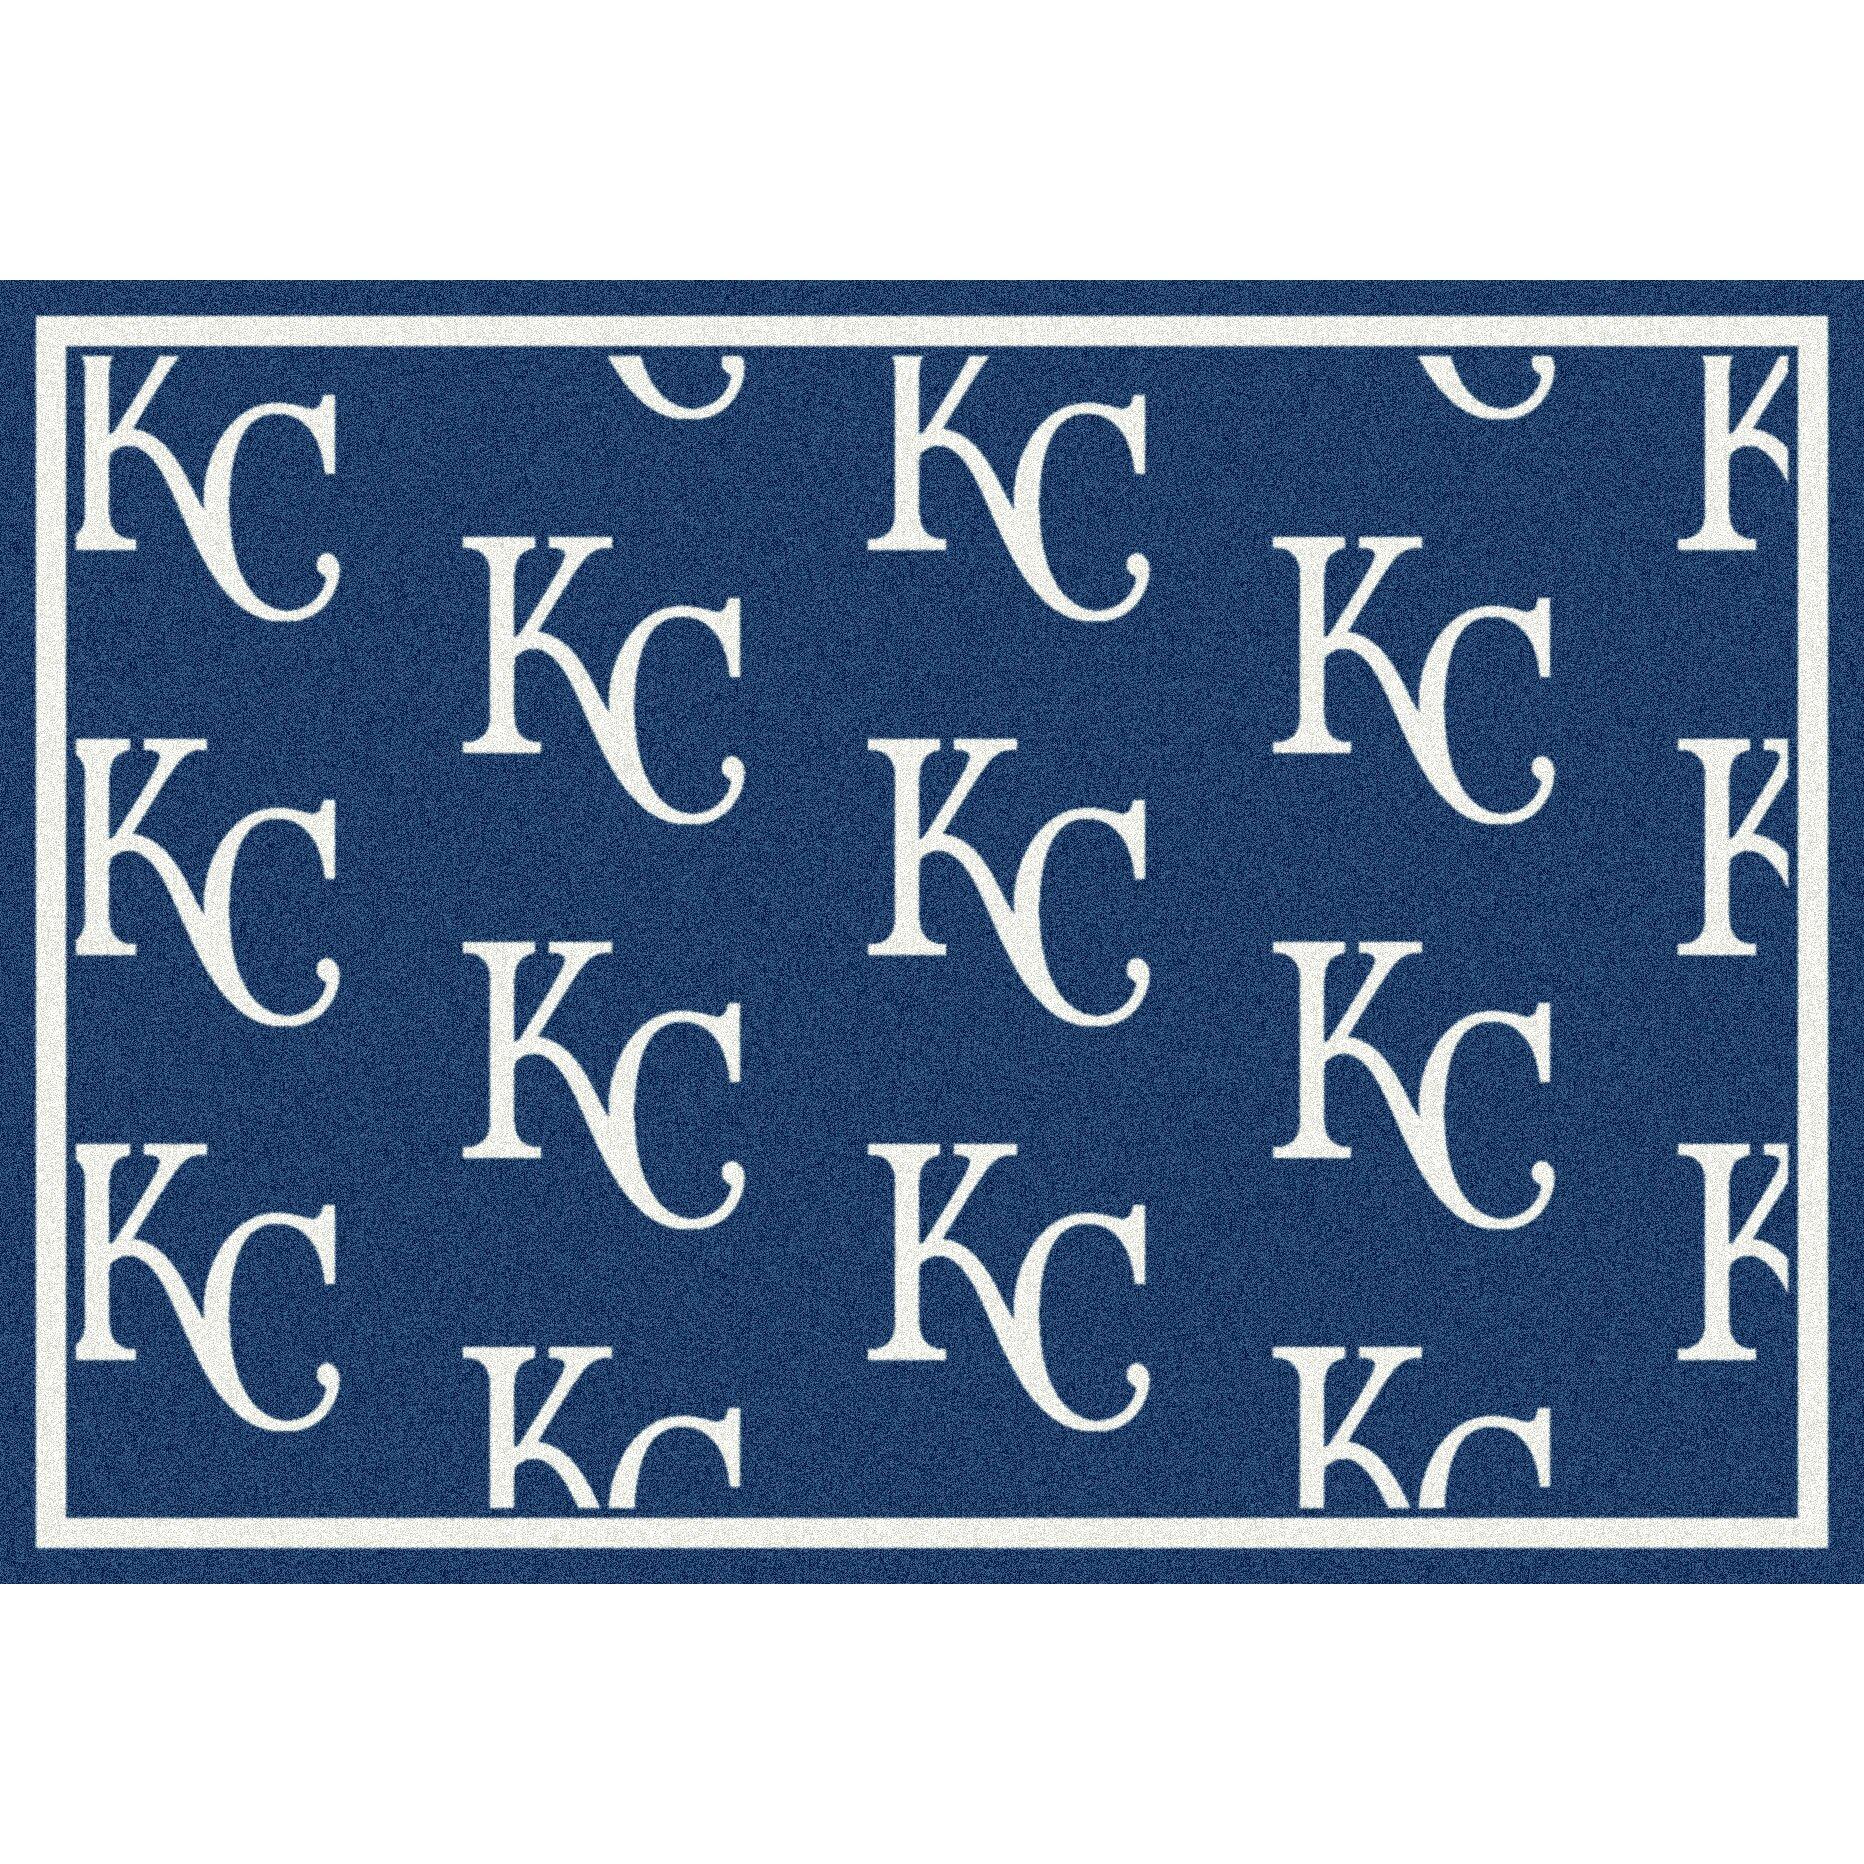 Superb Baseball Bathroom Rug MLB Team Repeat Kansas City Royals Baseball Novelty  Rug .